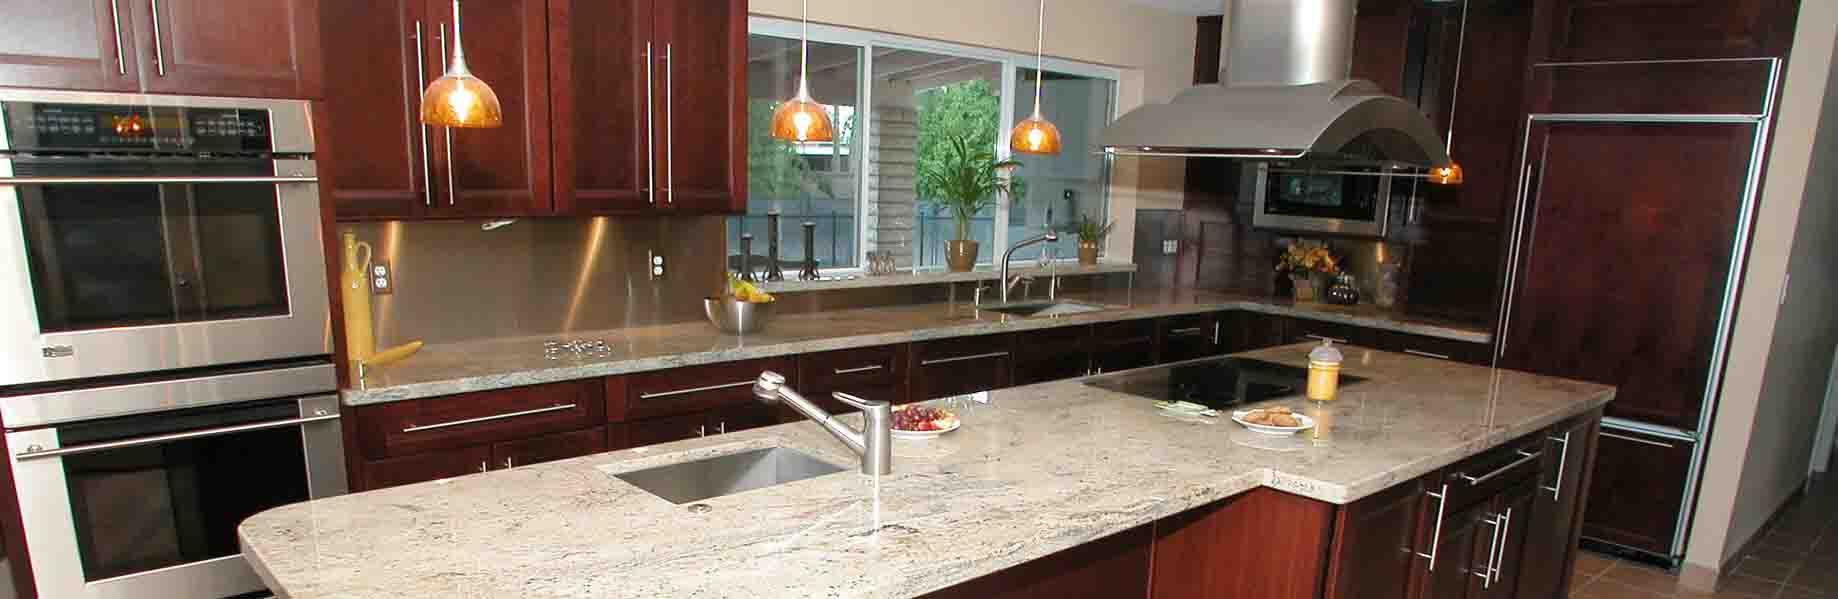 slide-granite-countertop-kitchen